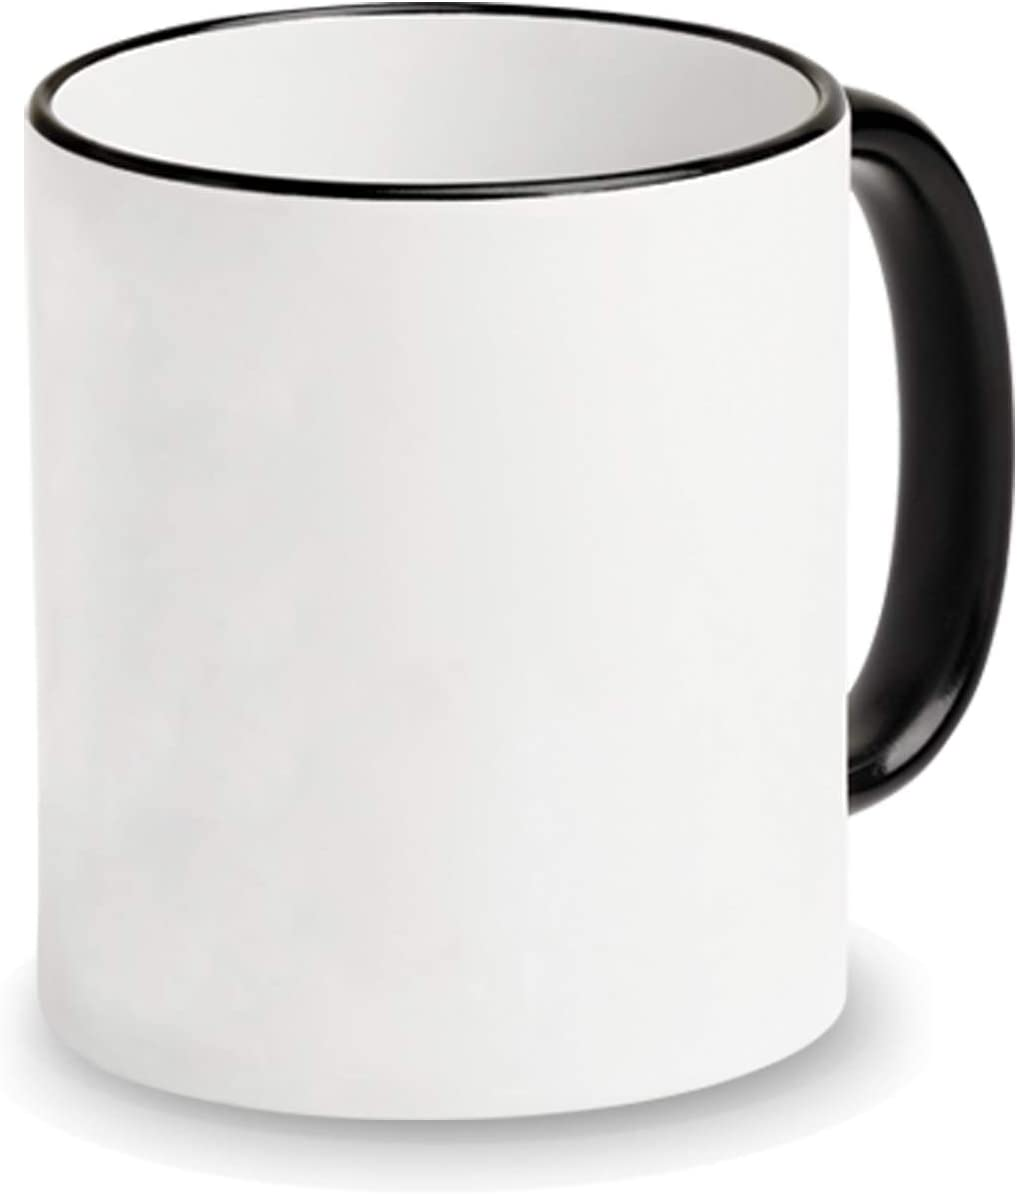 11 oz. Sublimation Mug with Black Halo and Handle